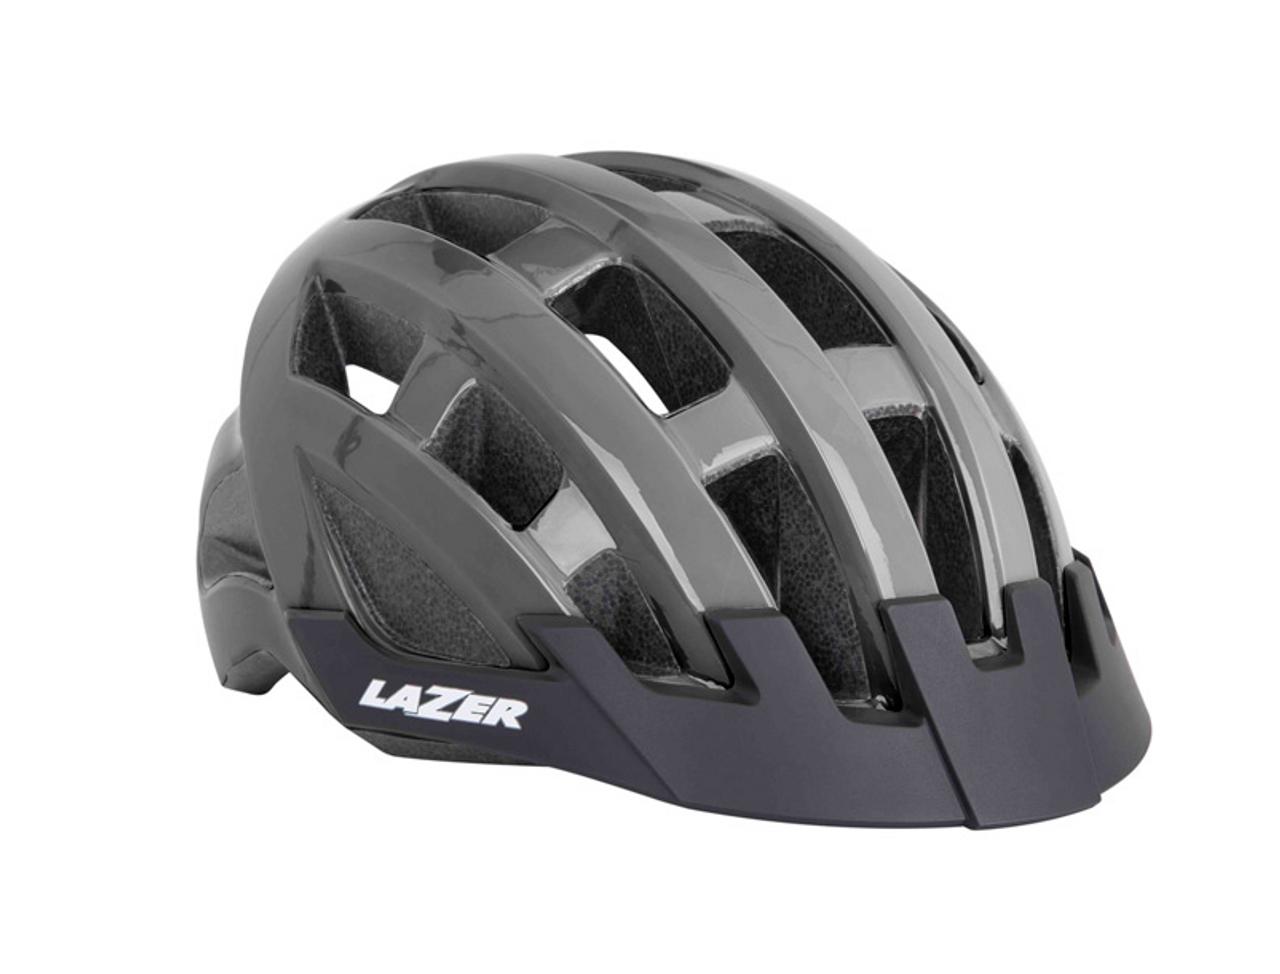 Laser Compact Adult Urban/Commuter Helmet